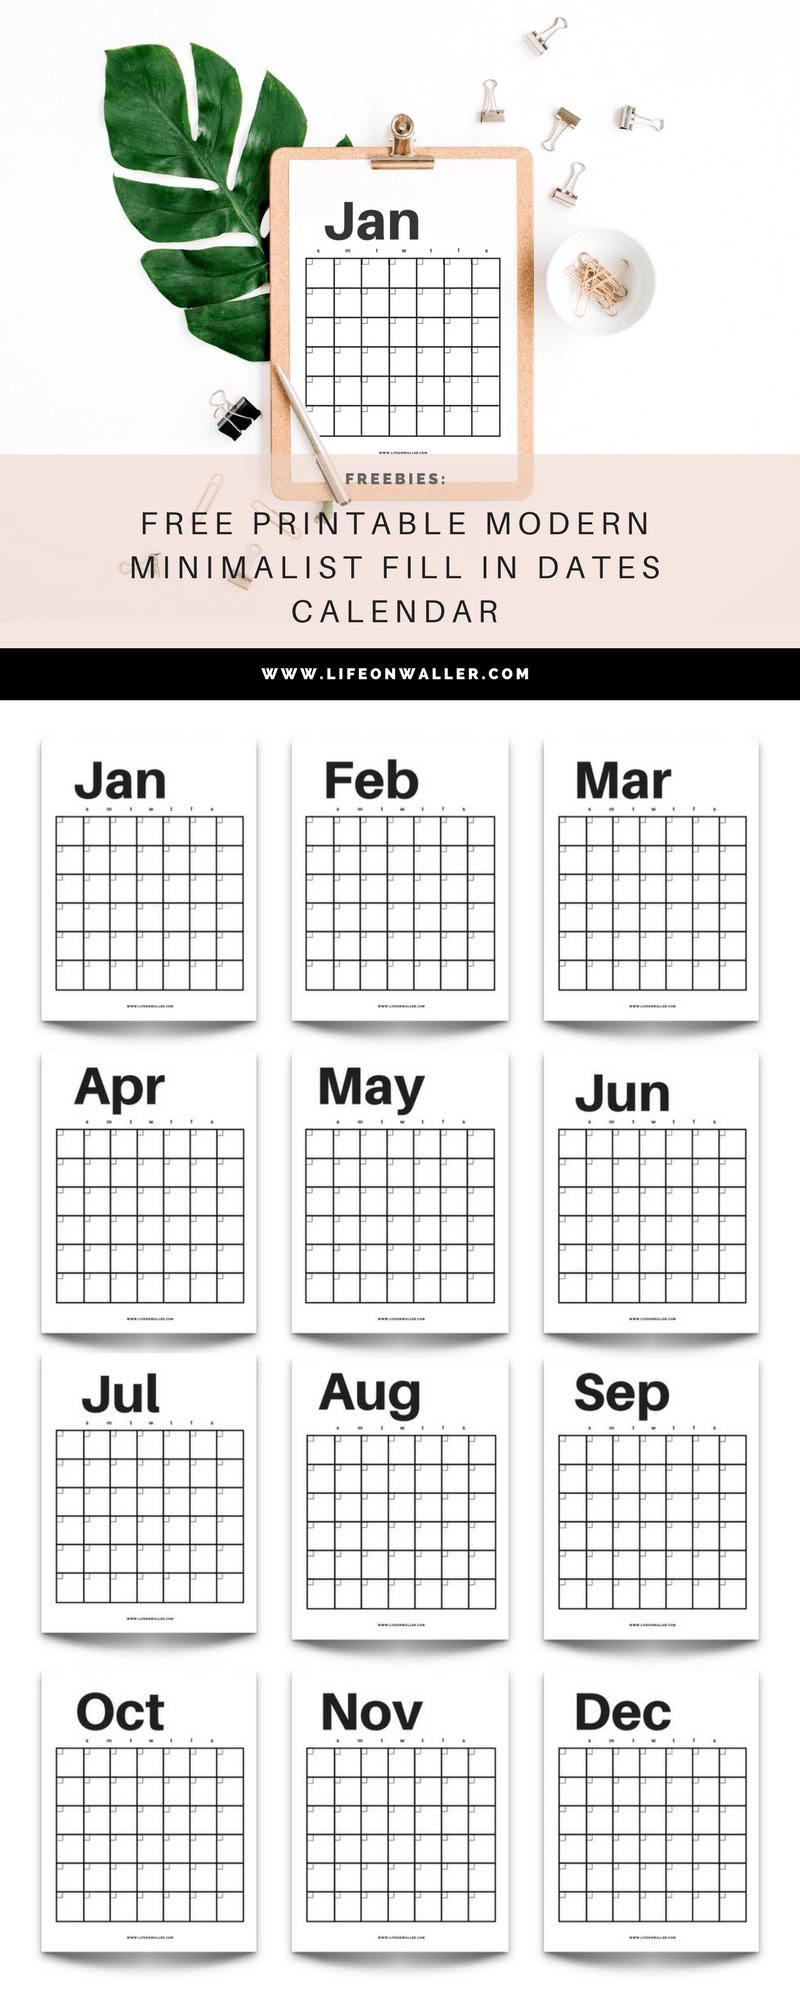 free printable modern minimalist calendar